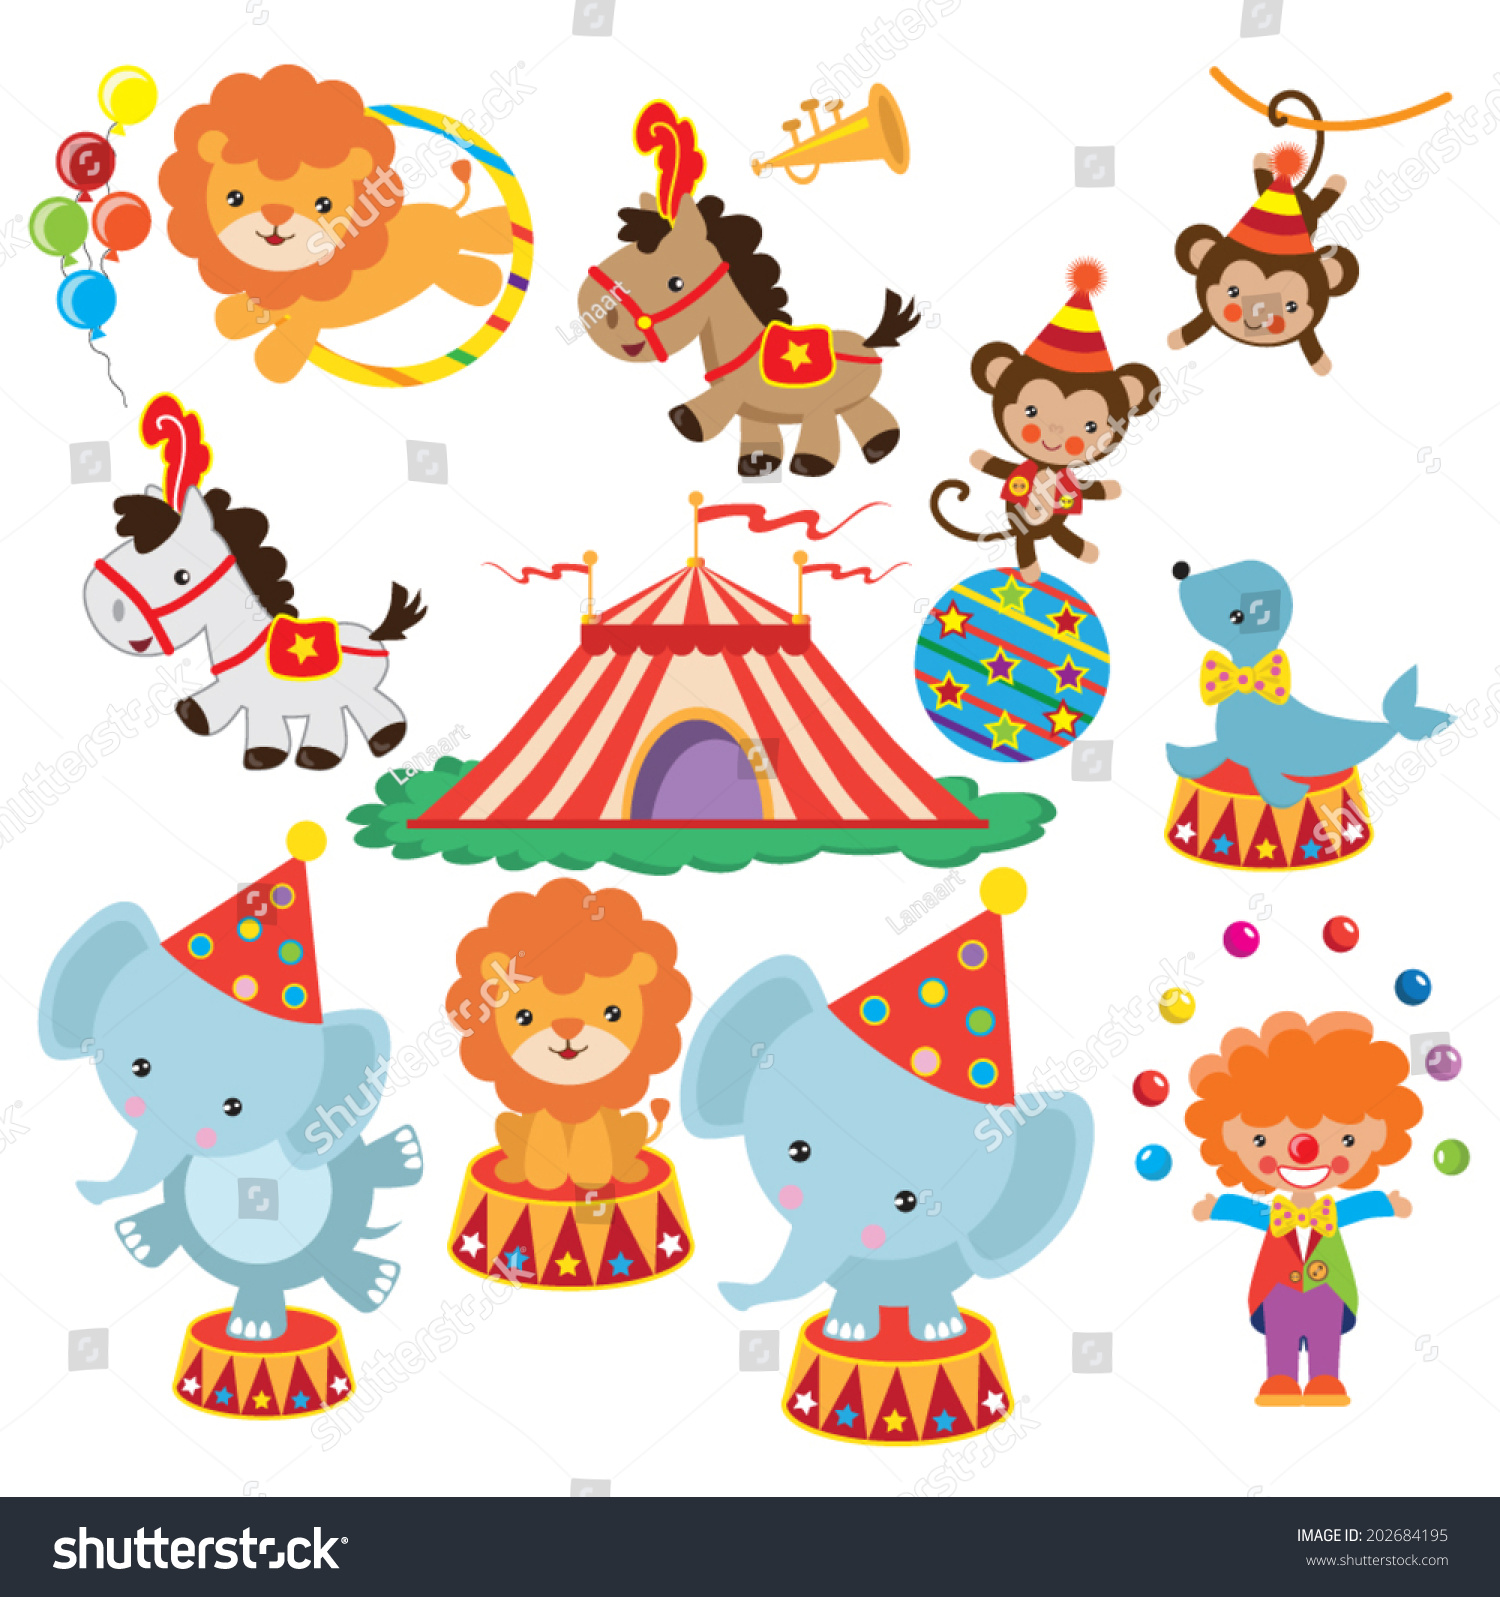 Circus Vector Illustration Stock Vector 202684195 - Shutterstock